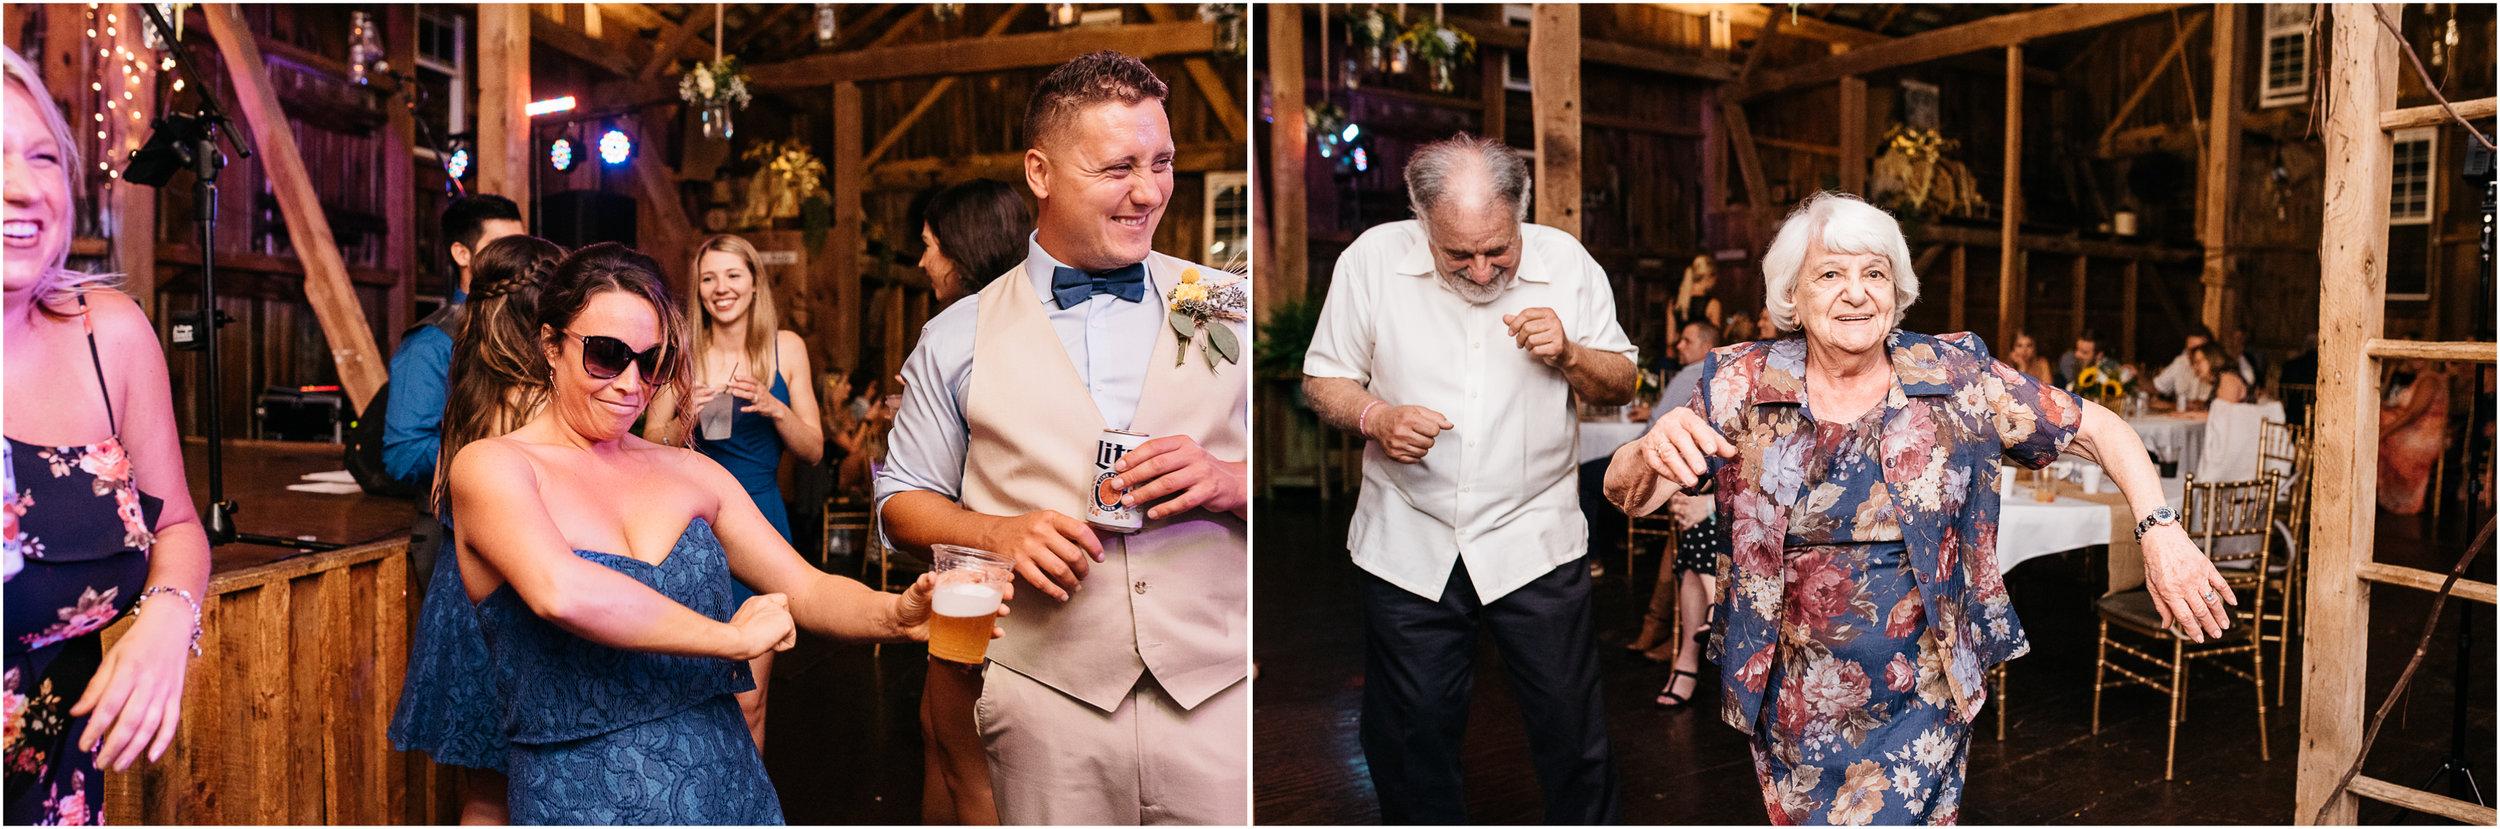 reception dancing, mariah fisher photography, hayloft of pa.jpg